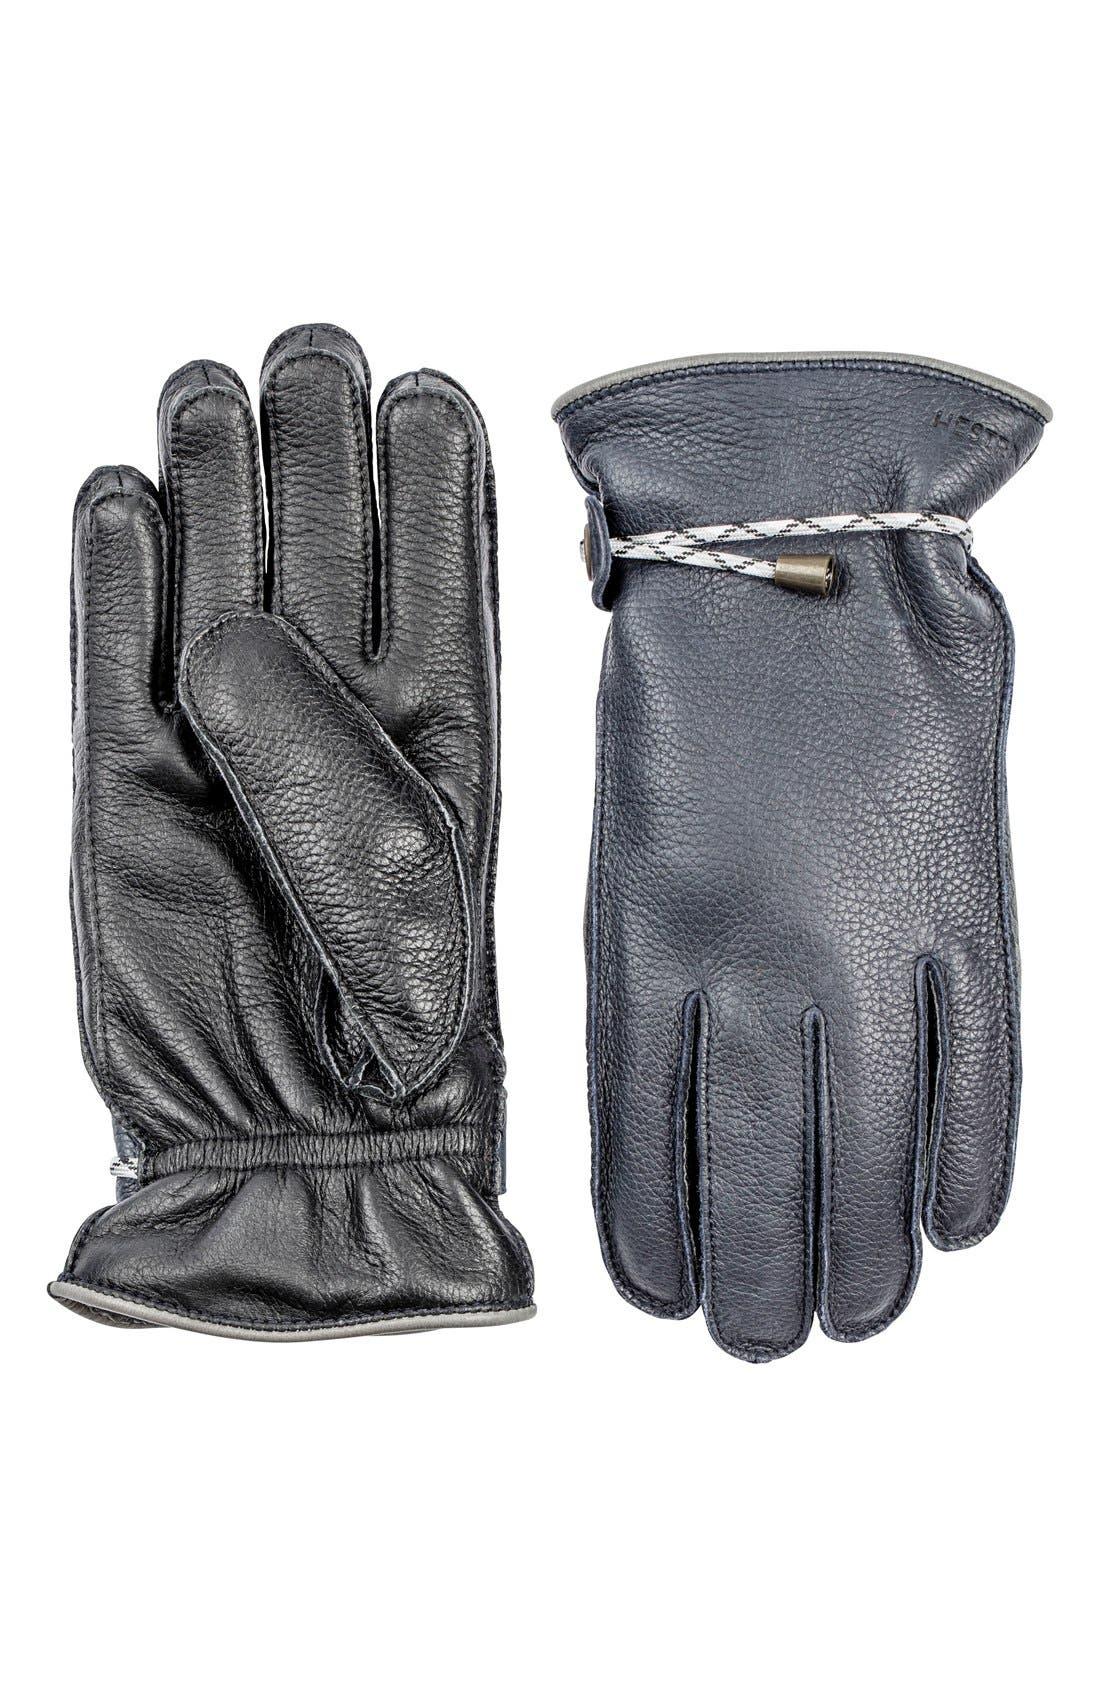 'Granvik' Leather Gloves,                             Main thumbnail 1, color,                             001